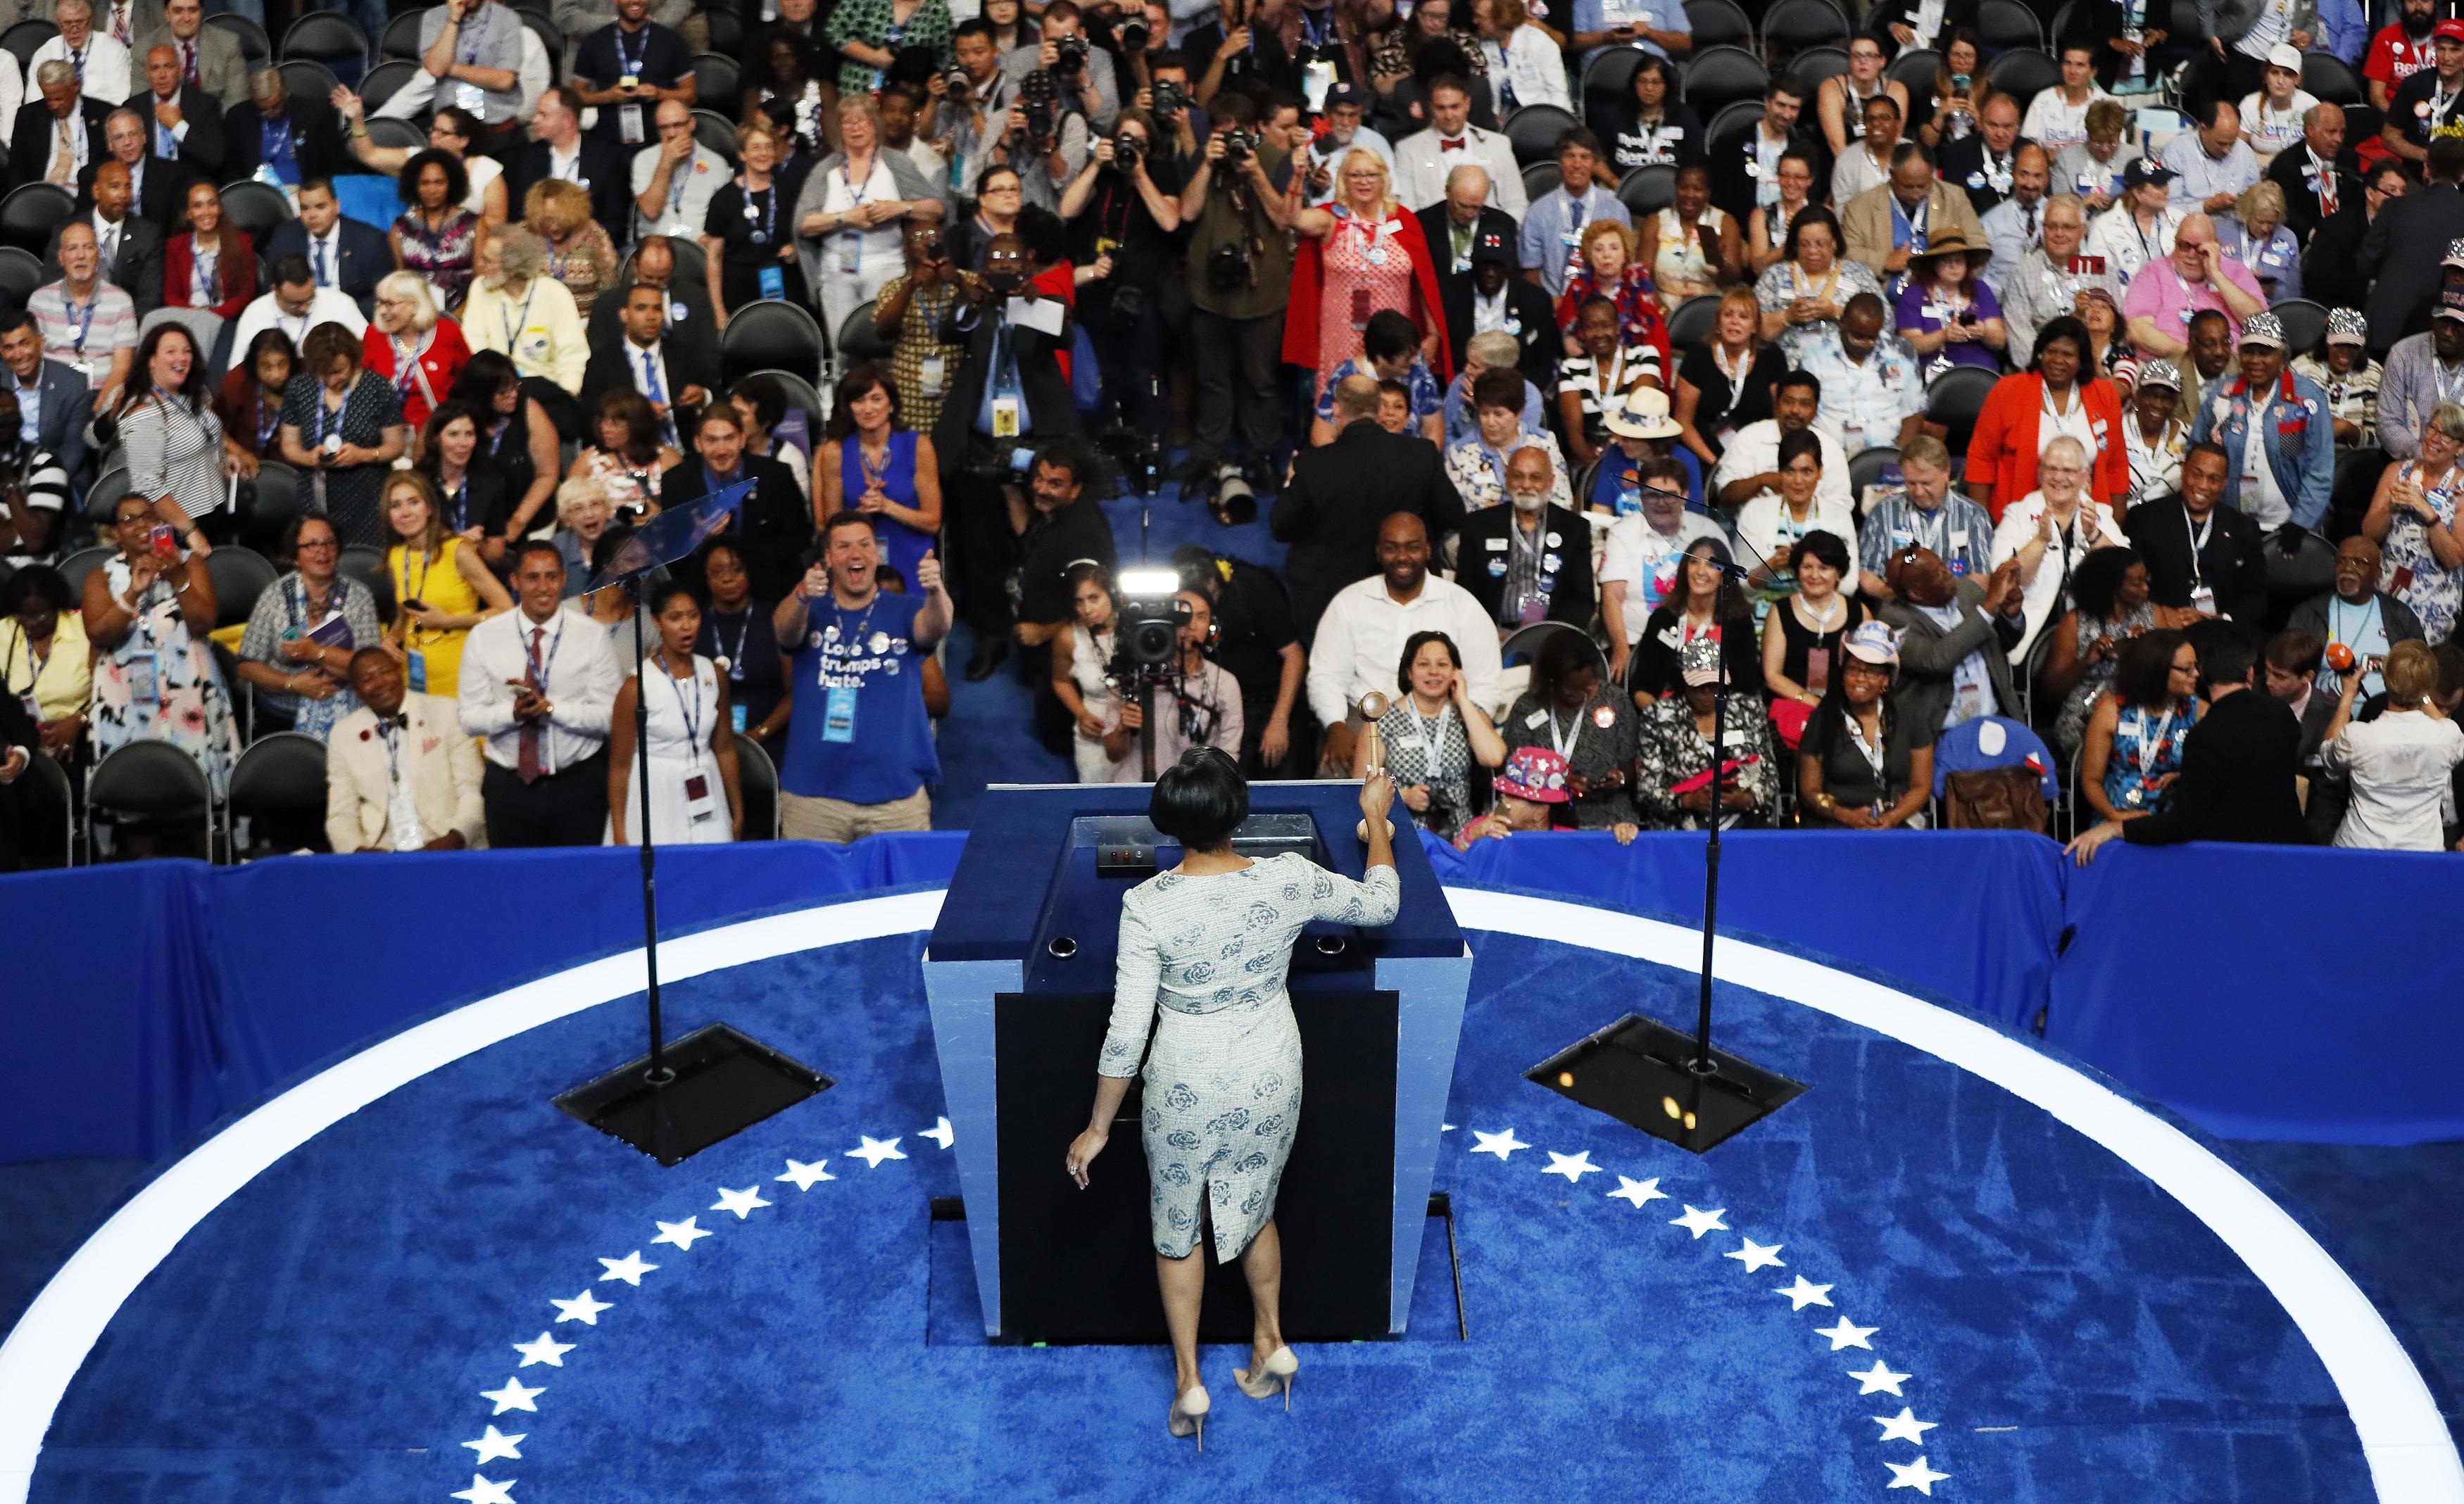 Stephanie Rawlings-Blake gavels-in the Democratic National Convention in Philadelphia